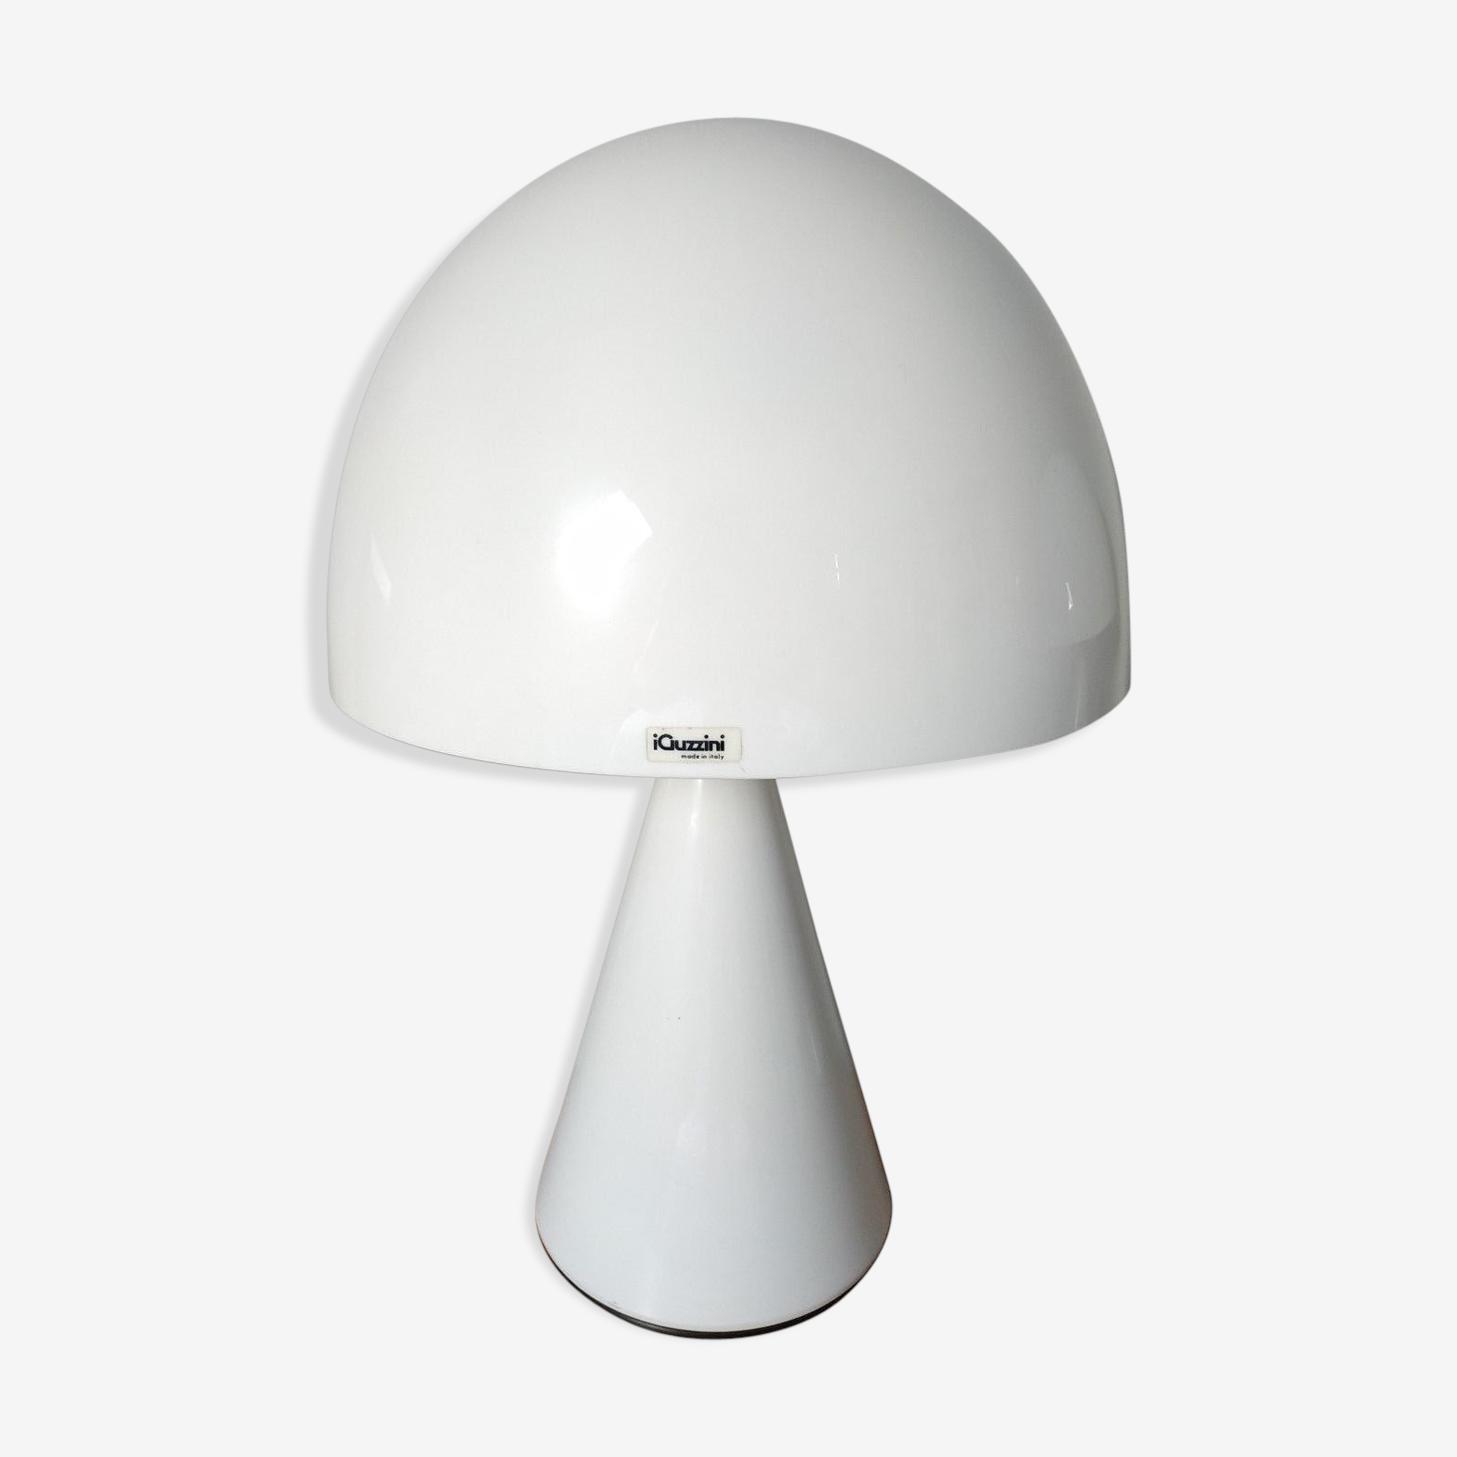 Lamp Design Guzzini 1970 Model Baobab Metal White Design Hfgsx35